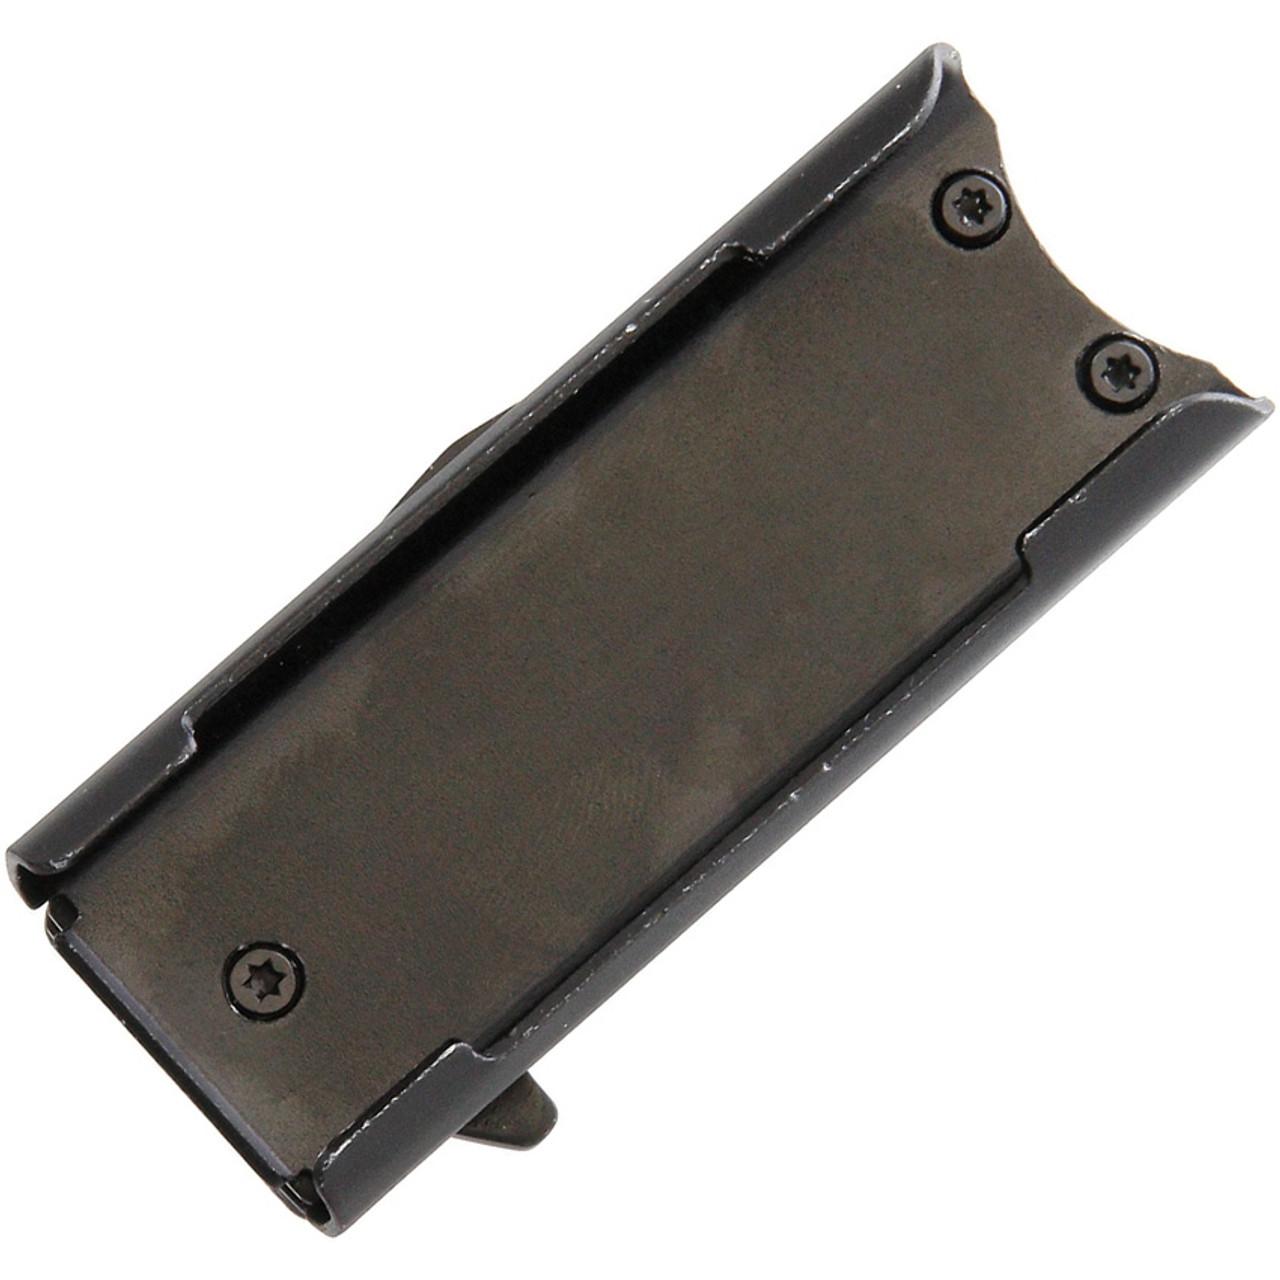 "Wild Boar Knife and Lighter Holder 1021, 1.75"" Stainless Blade, Black Aluminum Handle (Holds Standard Lighter)"